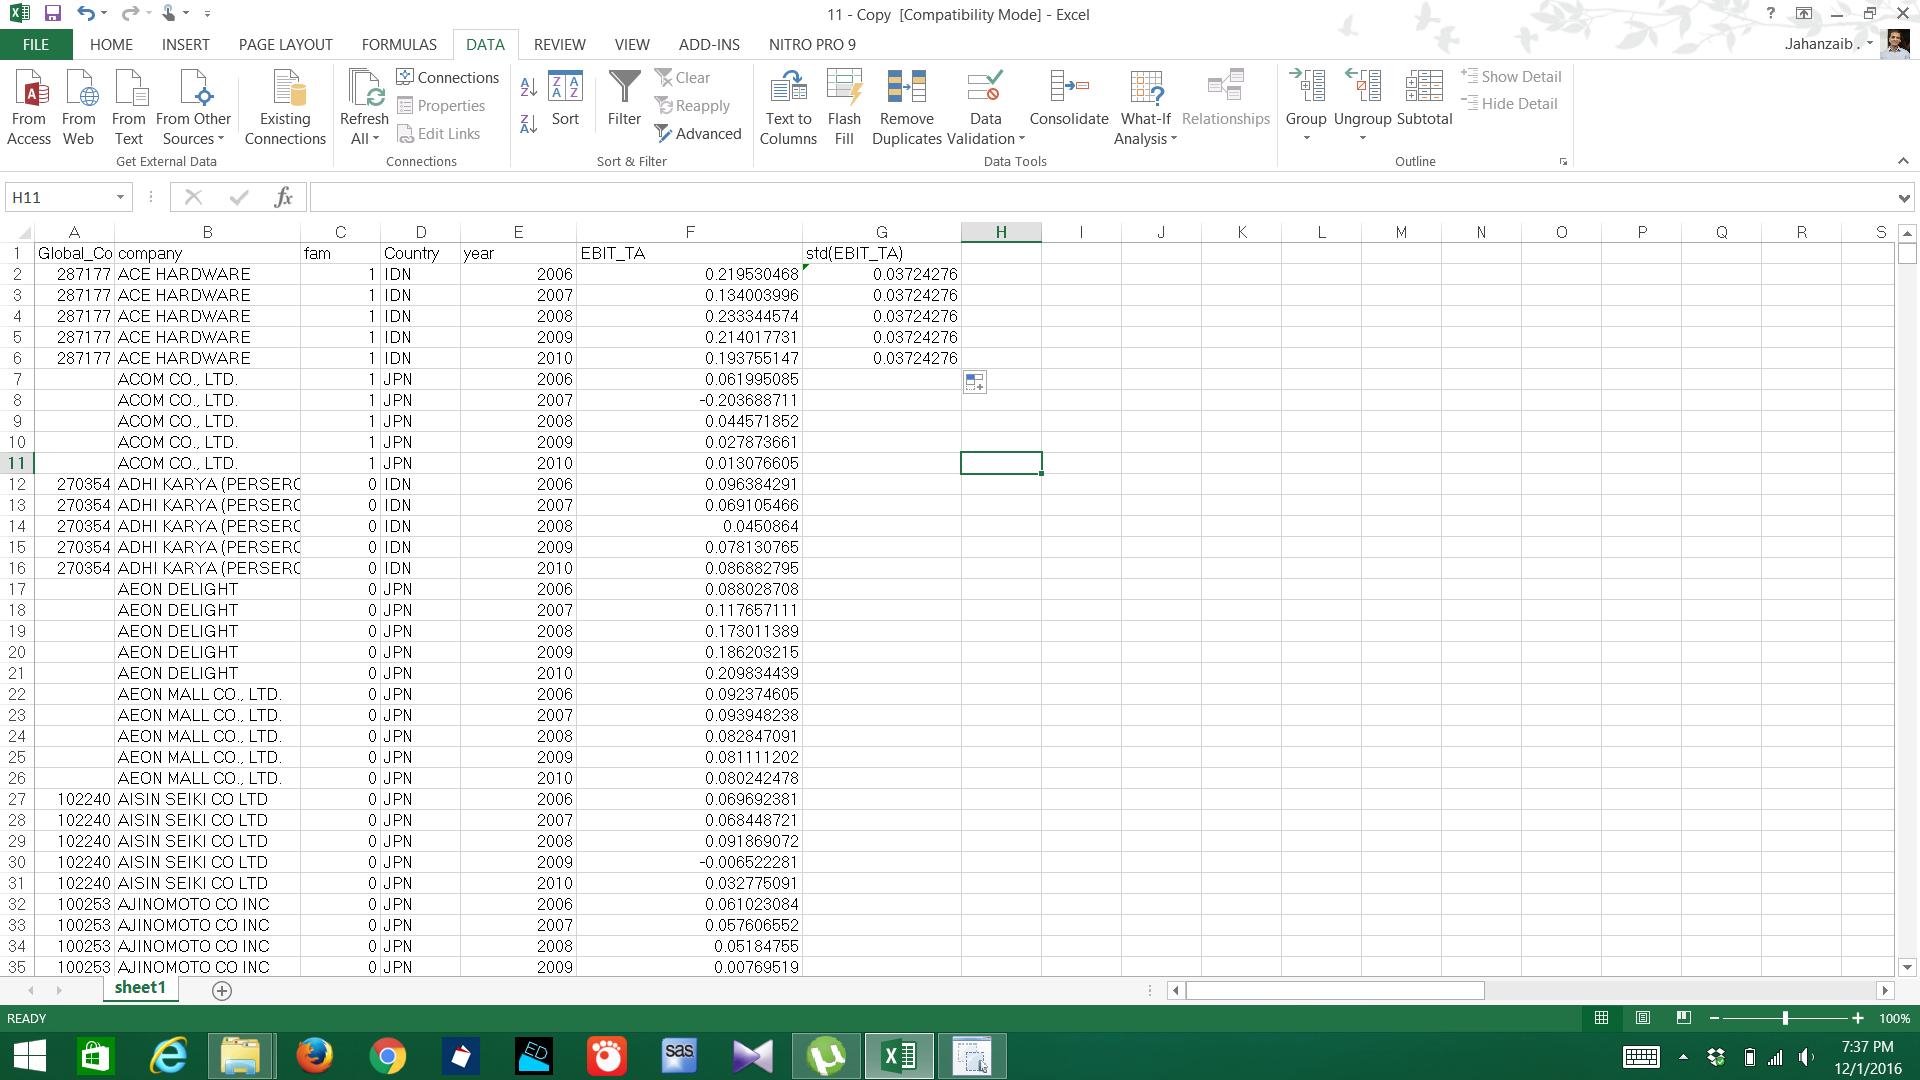 Screenshot 2016-12-01 19.37.23.png